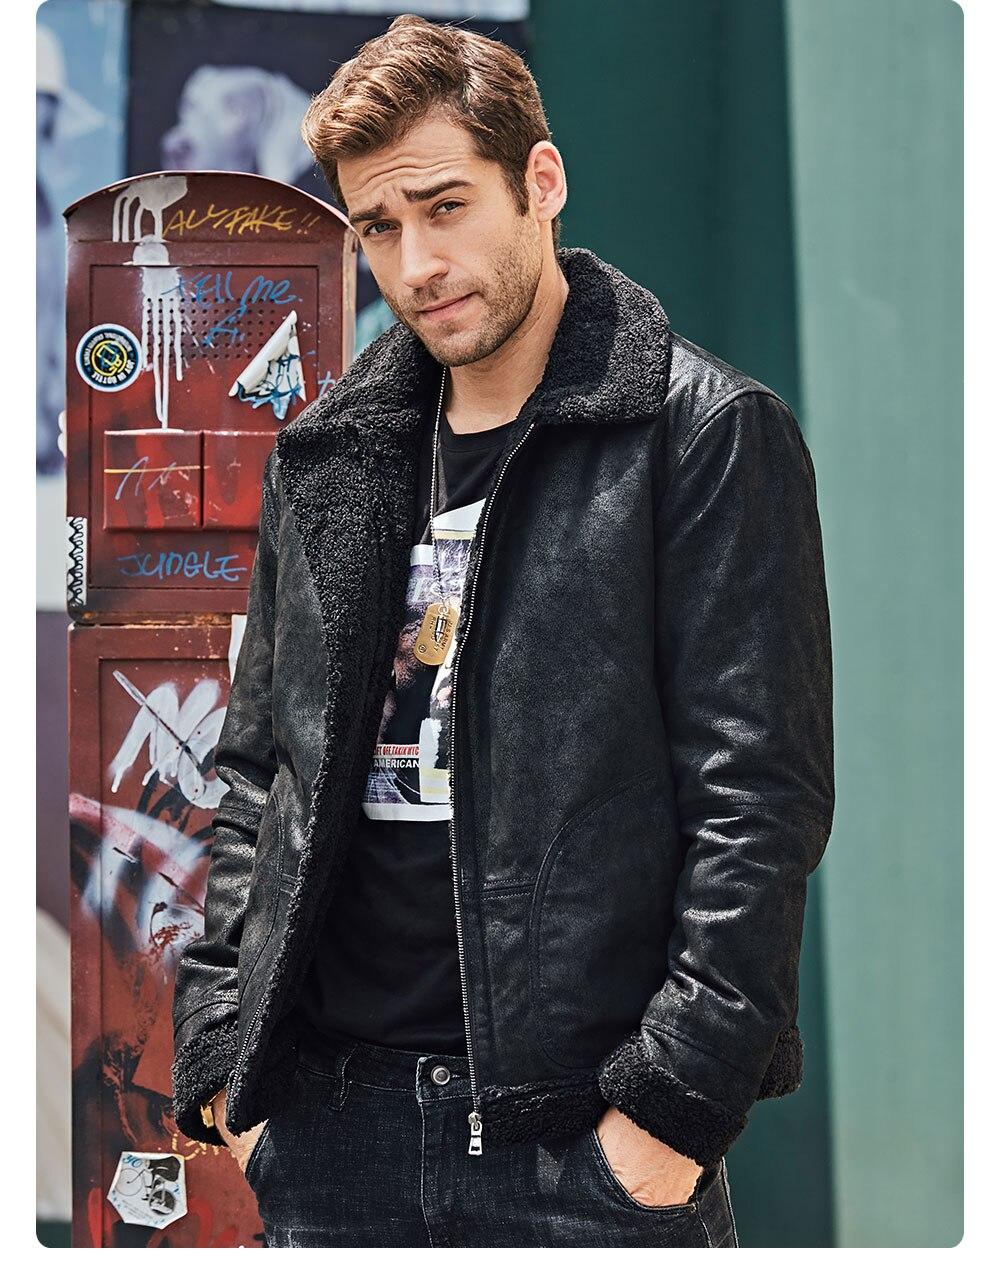 Hcfd8f6589c6f438eb59cb59d6144b2bee New Men's Real Leather Jacket Faux Fur Collar Genuine Leather Jacket